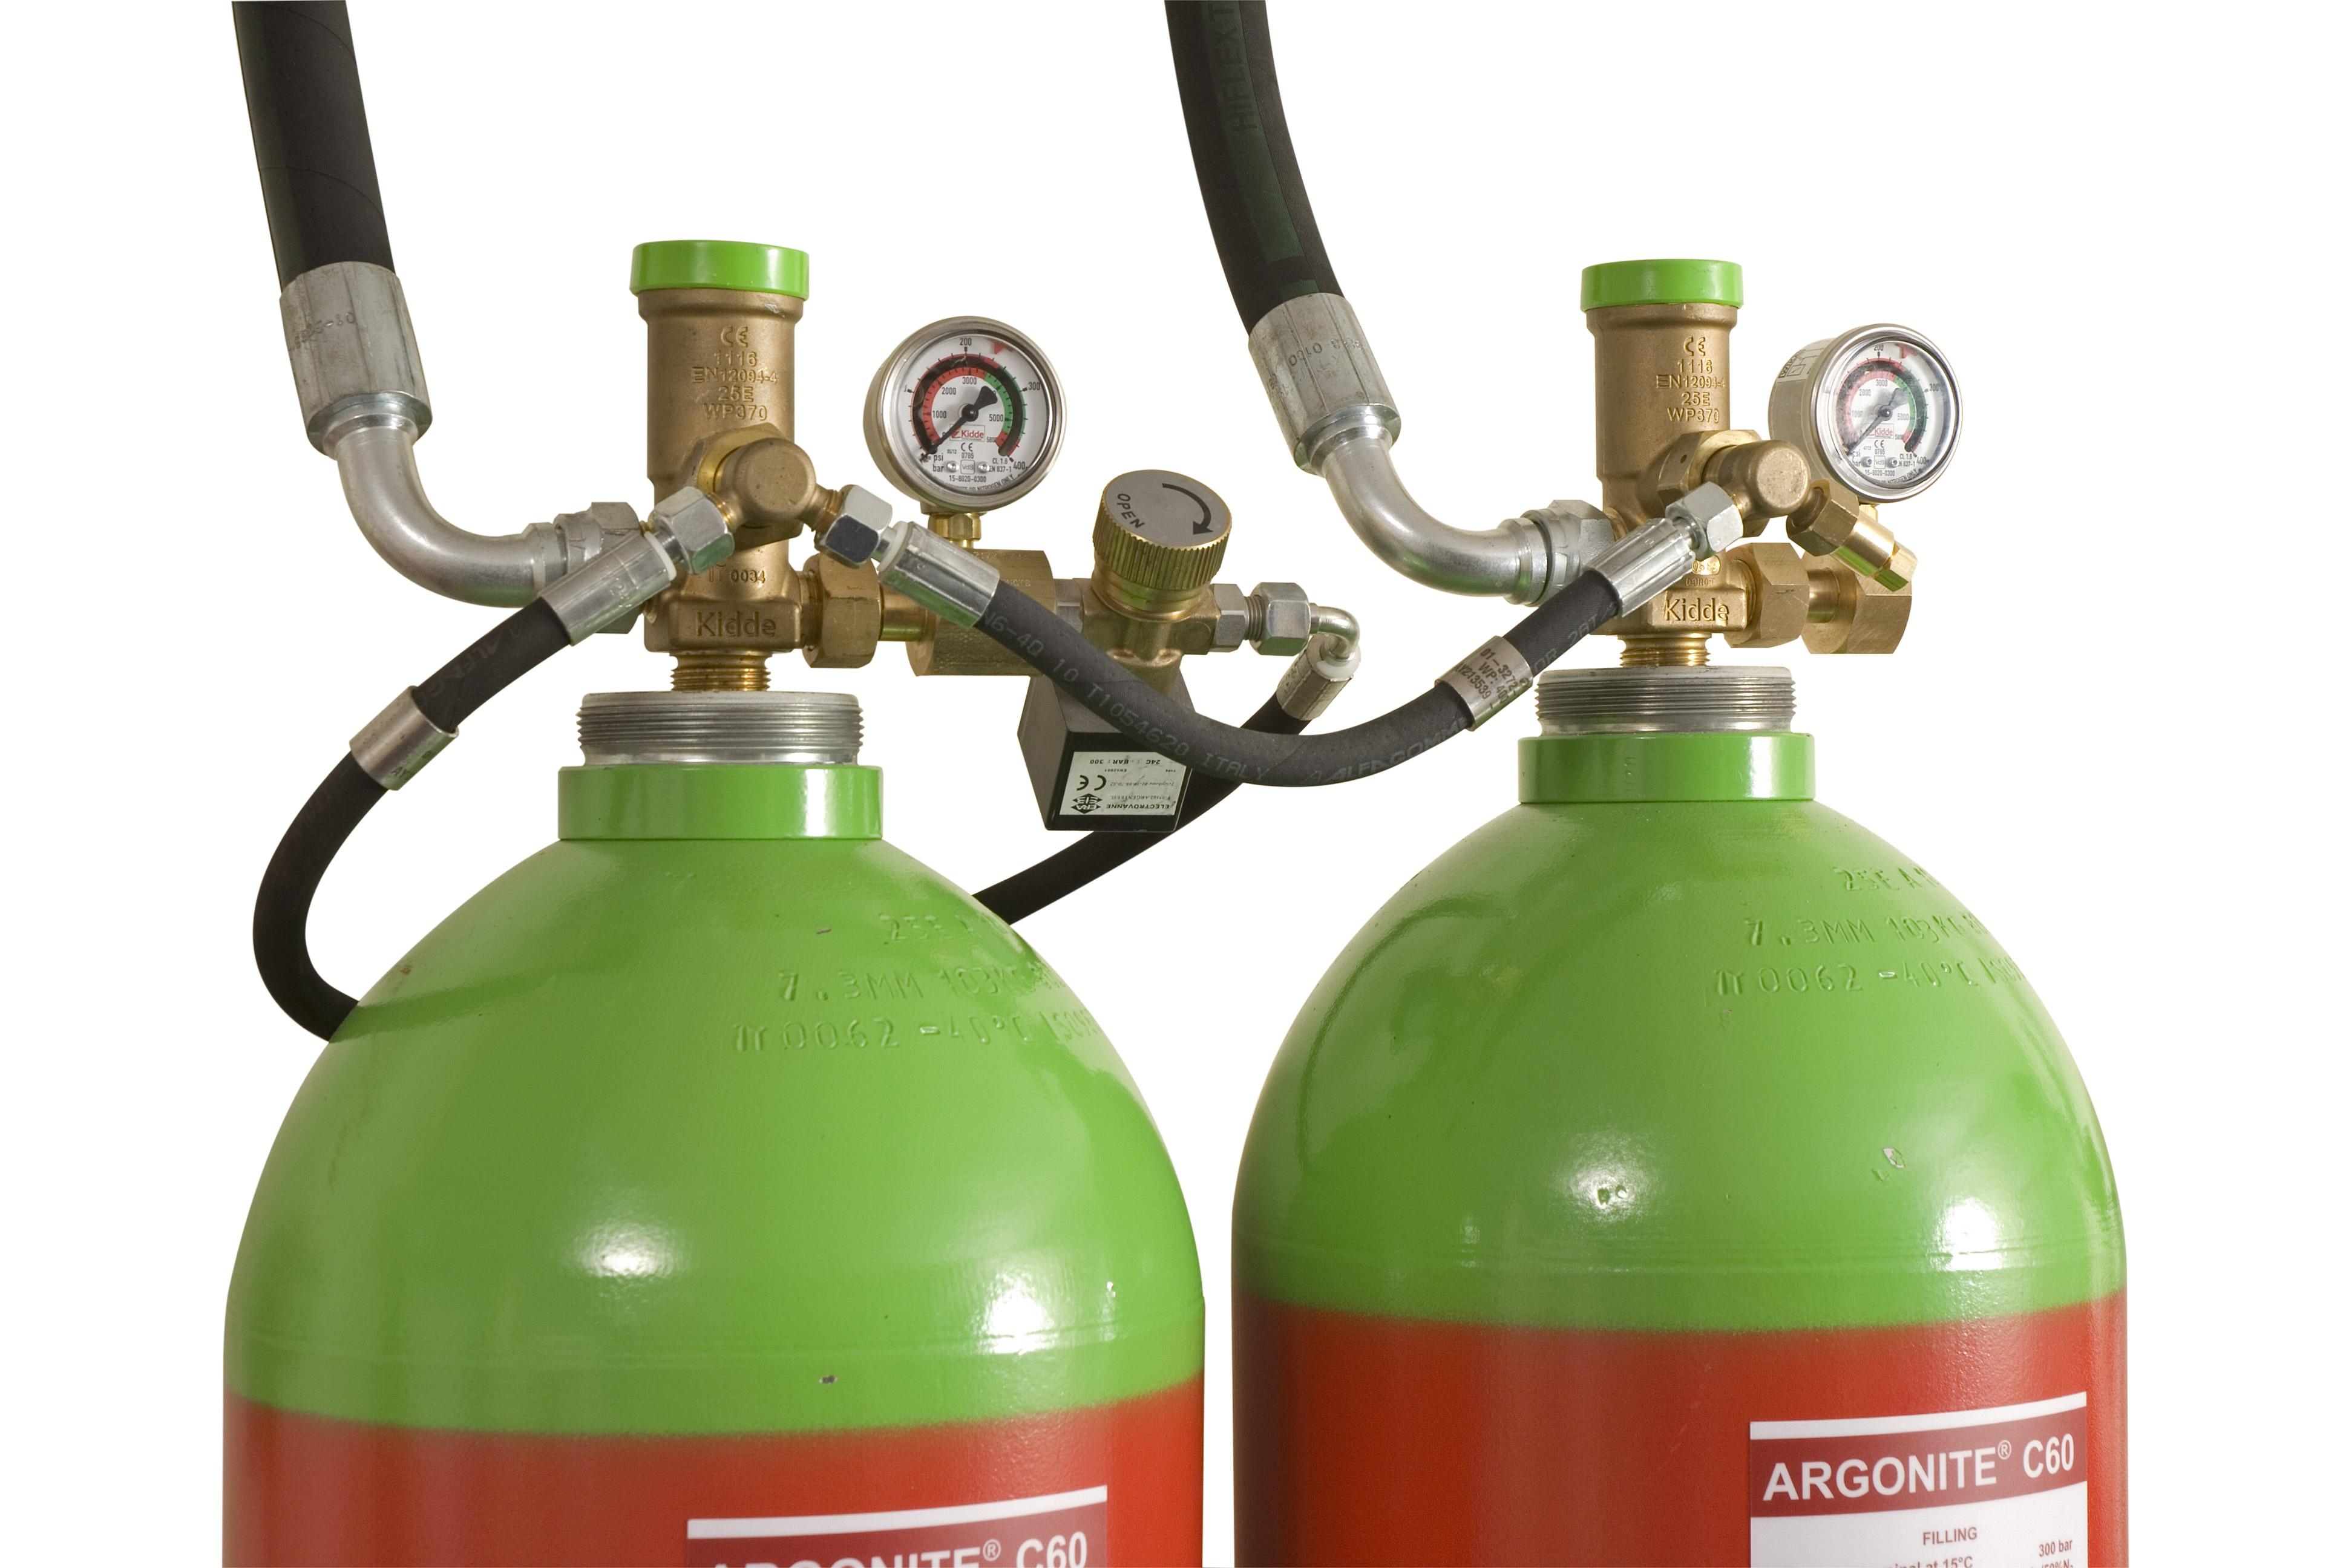 Kidde Argonite C60 Inert Gas Fire